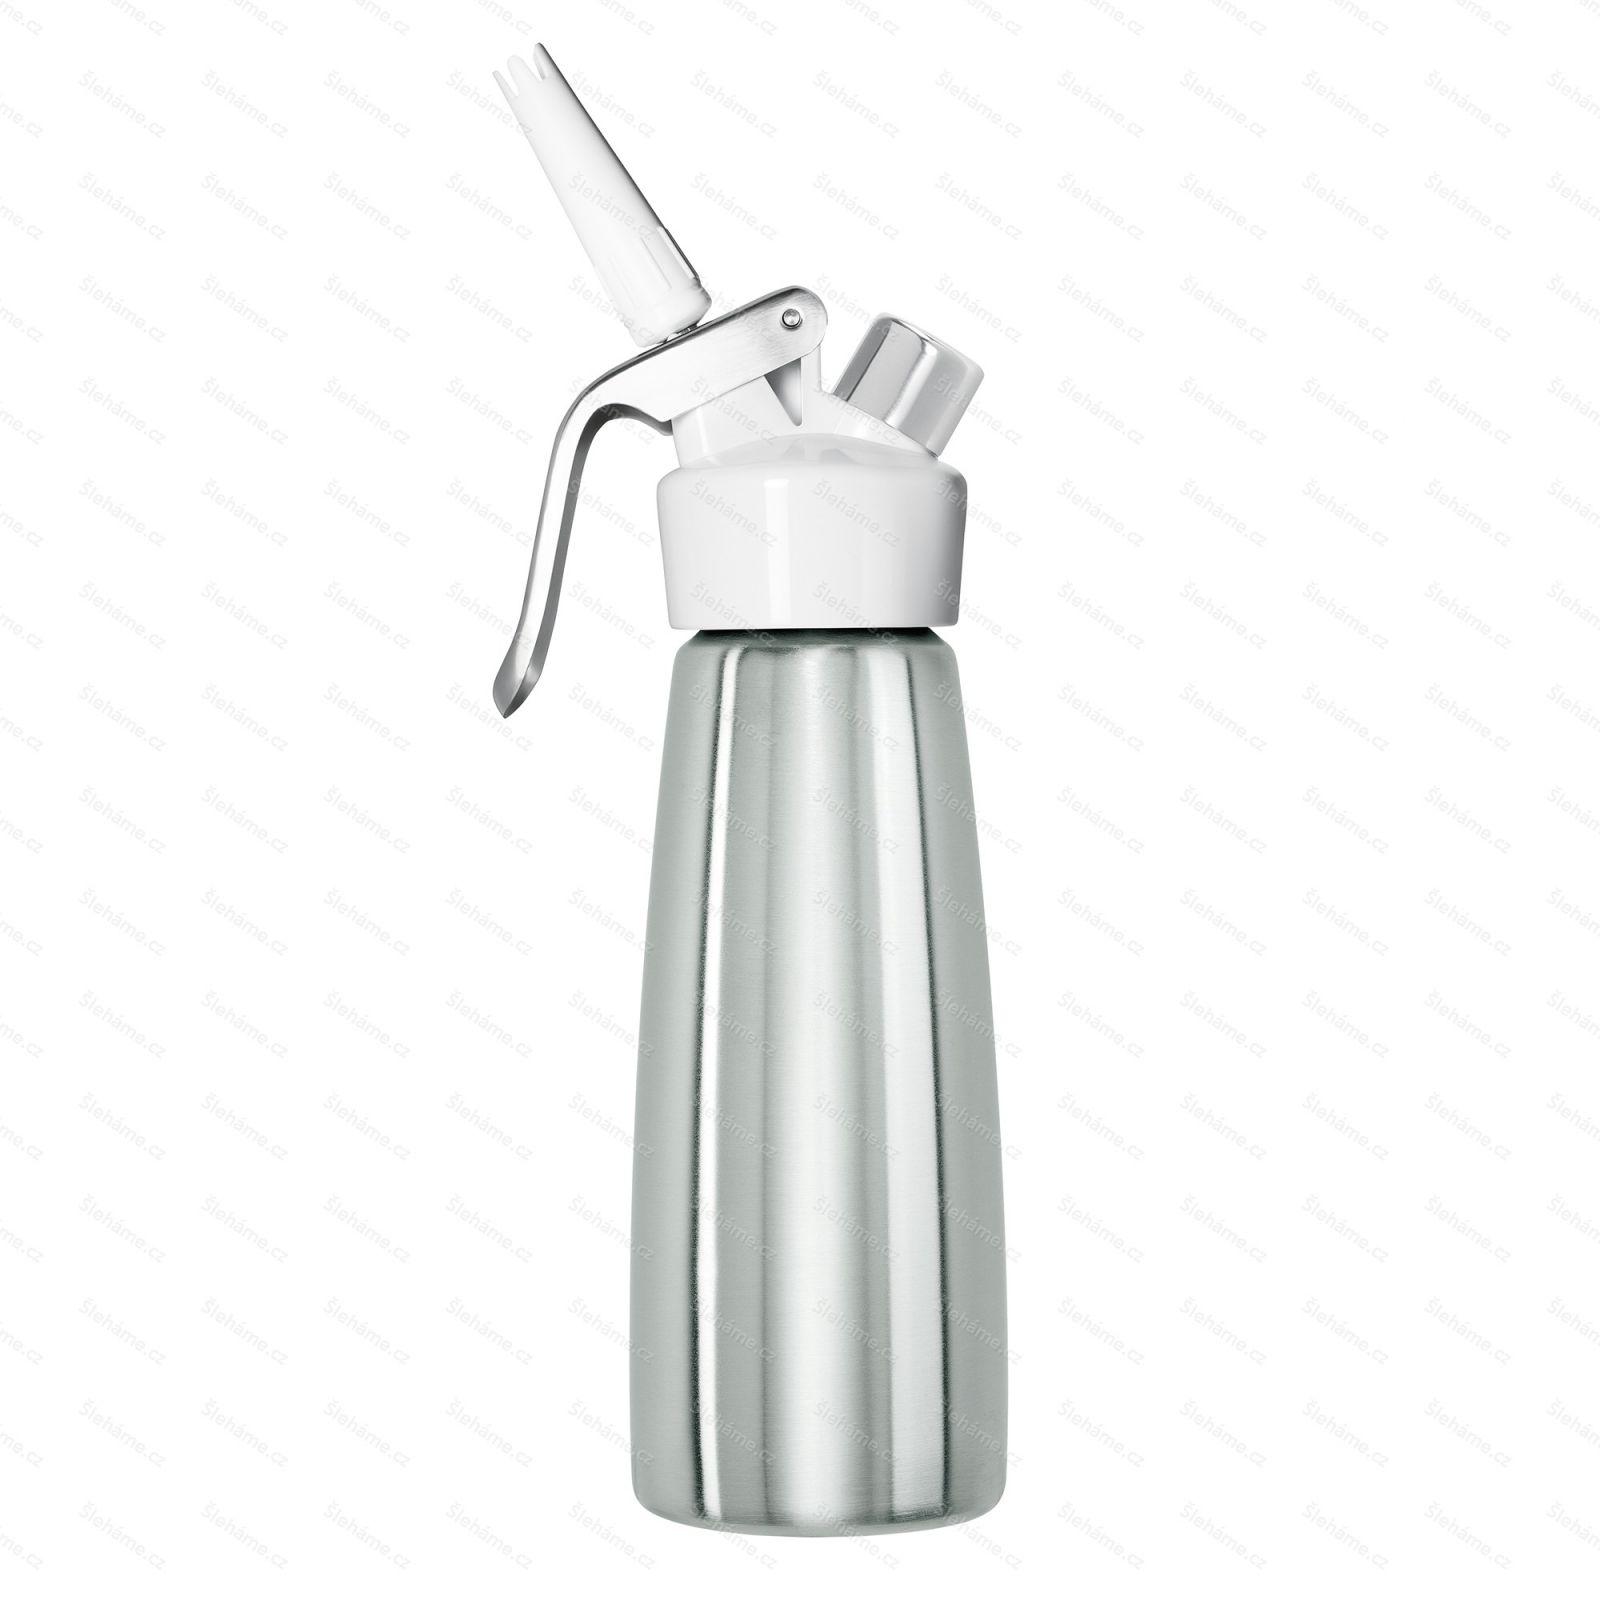 Šlehačková láhev iSi DESSERT WHIP NEW 0.5 l, bílá